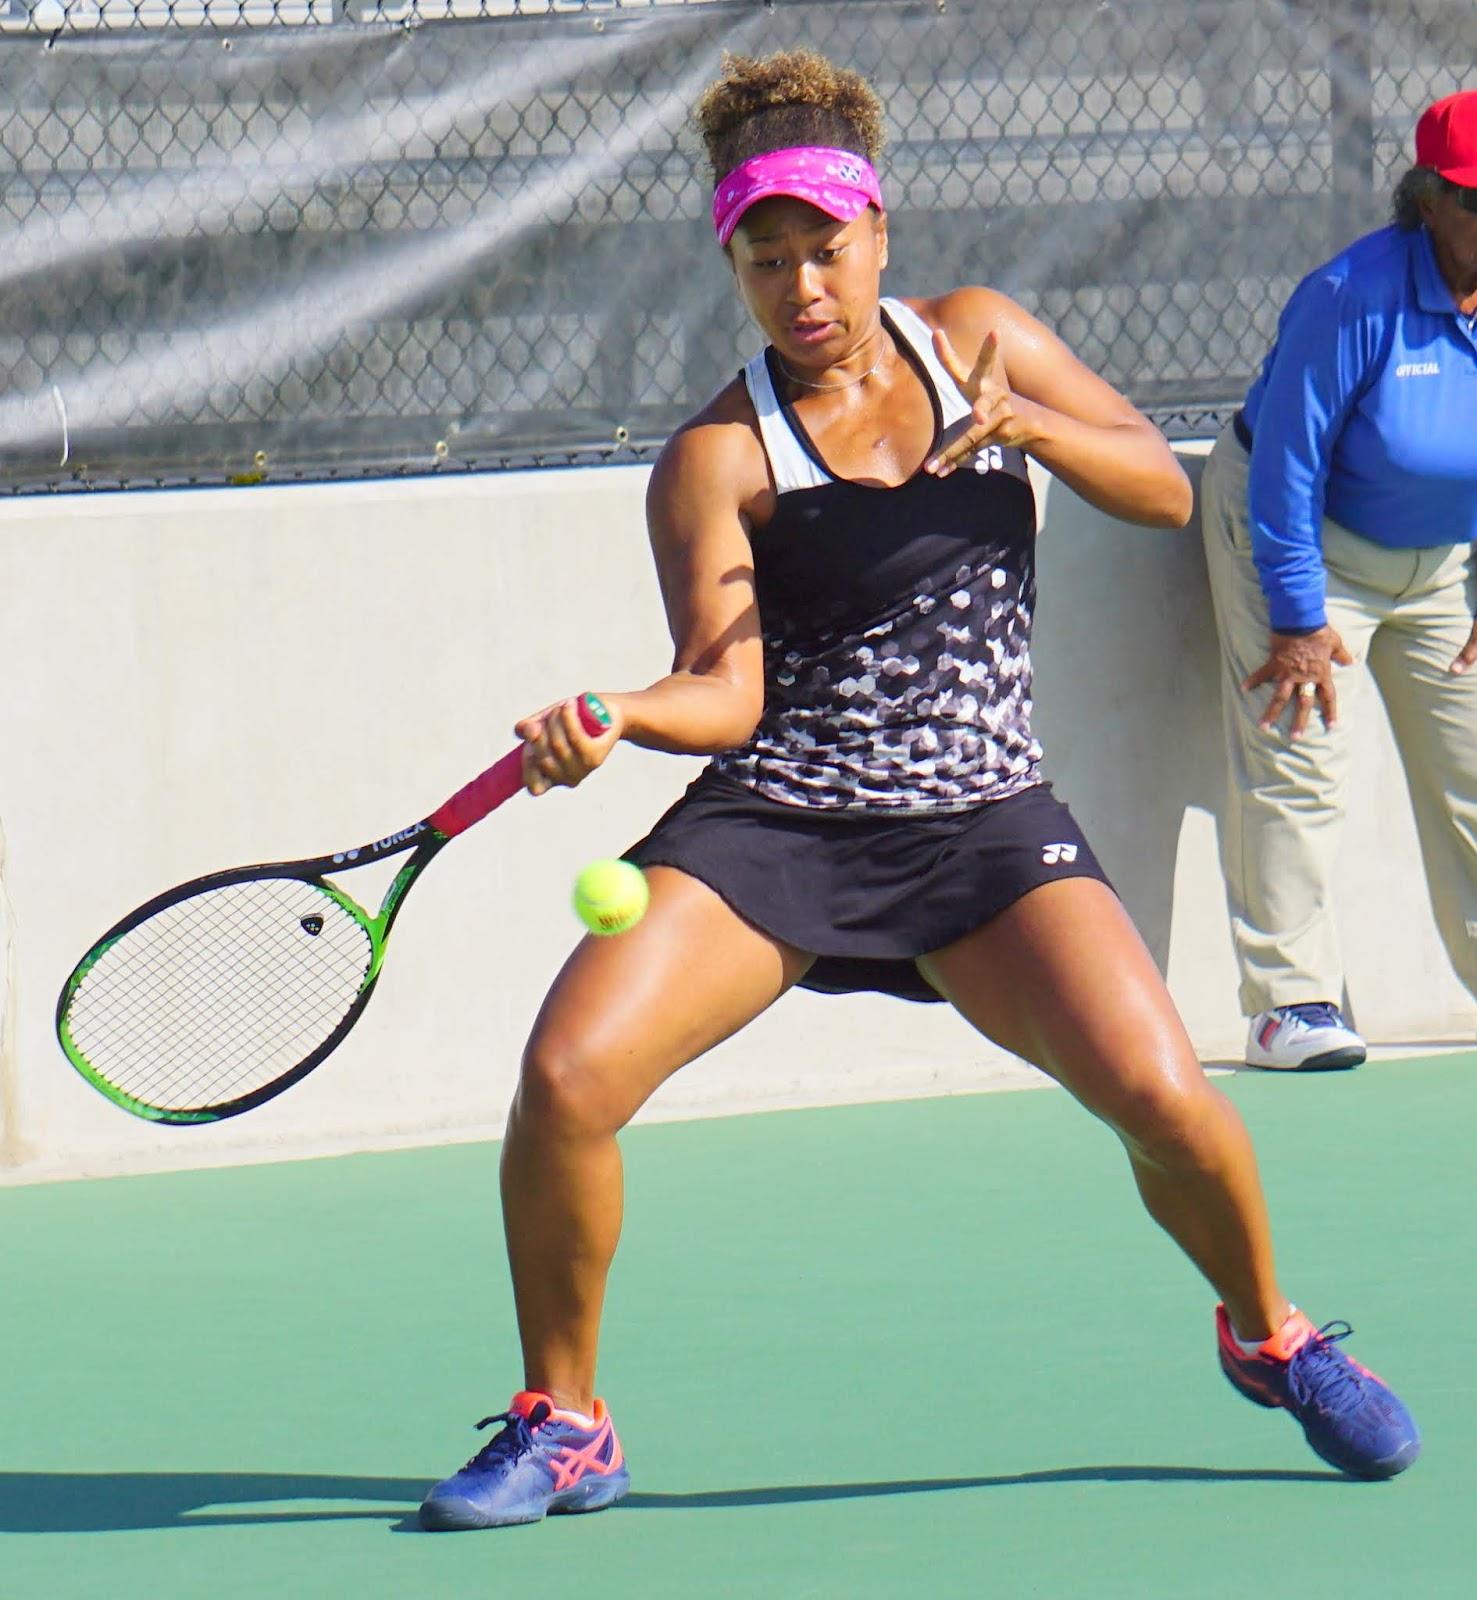 Francois Illas New Tradition: NorCal Tennis Czar: Barbados' King Thanks 'best Friend